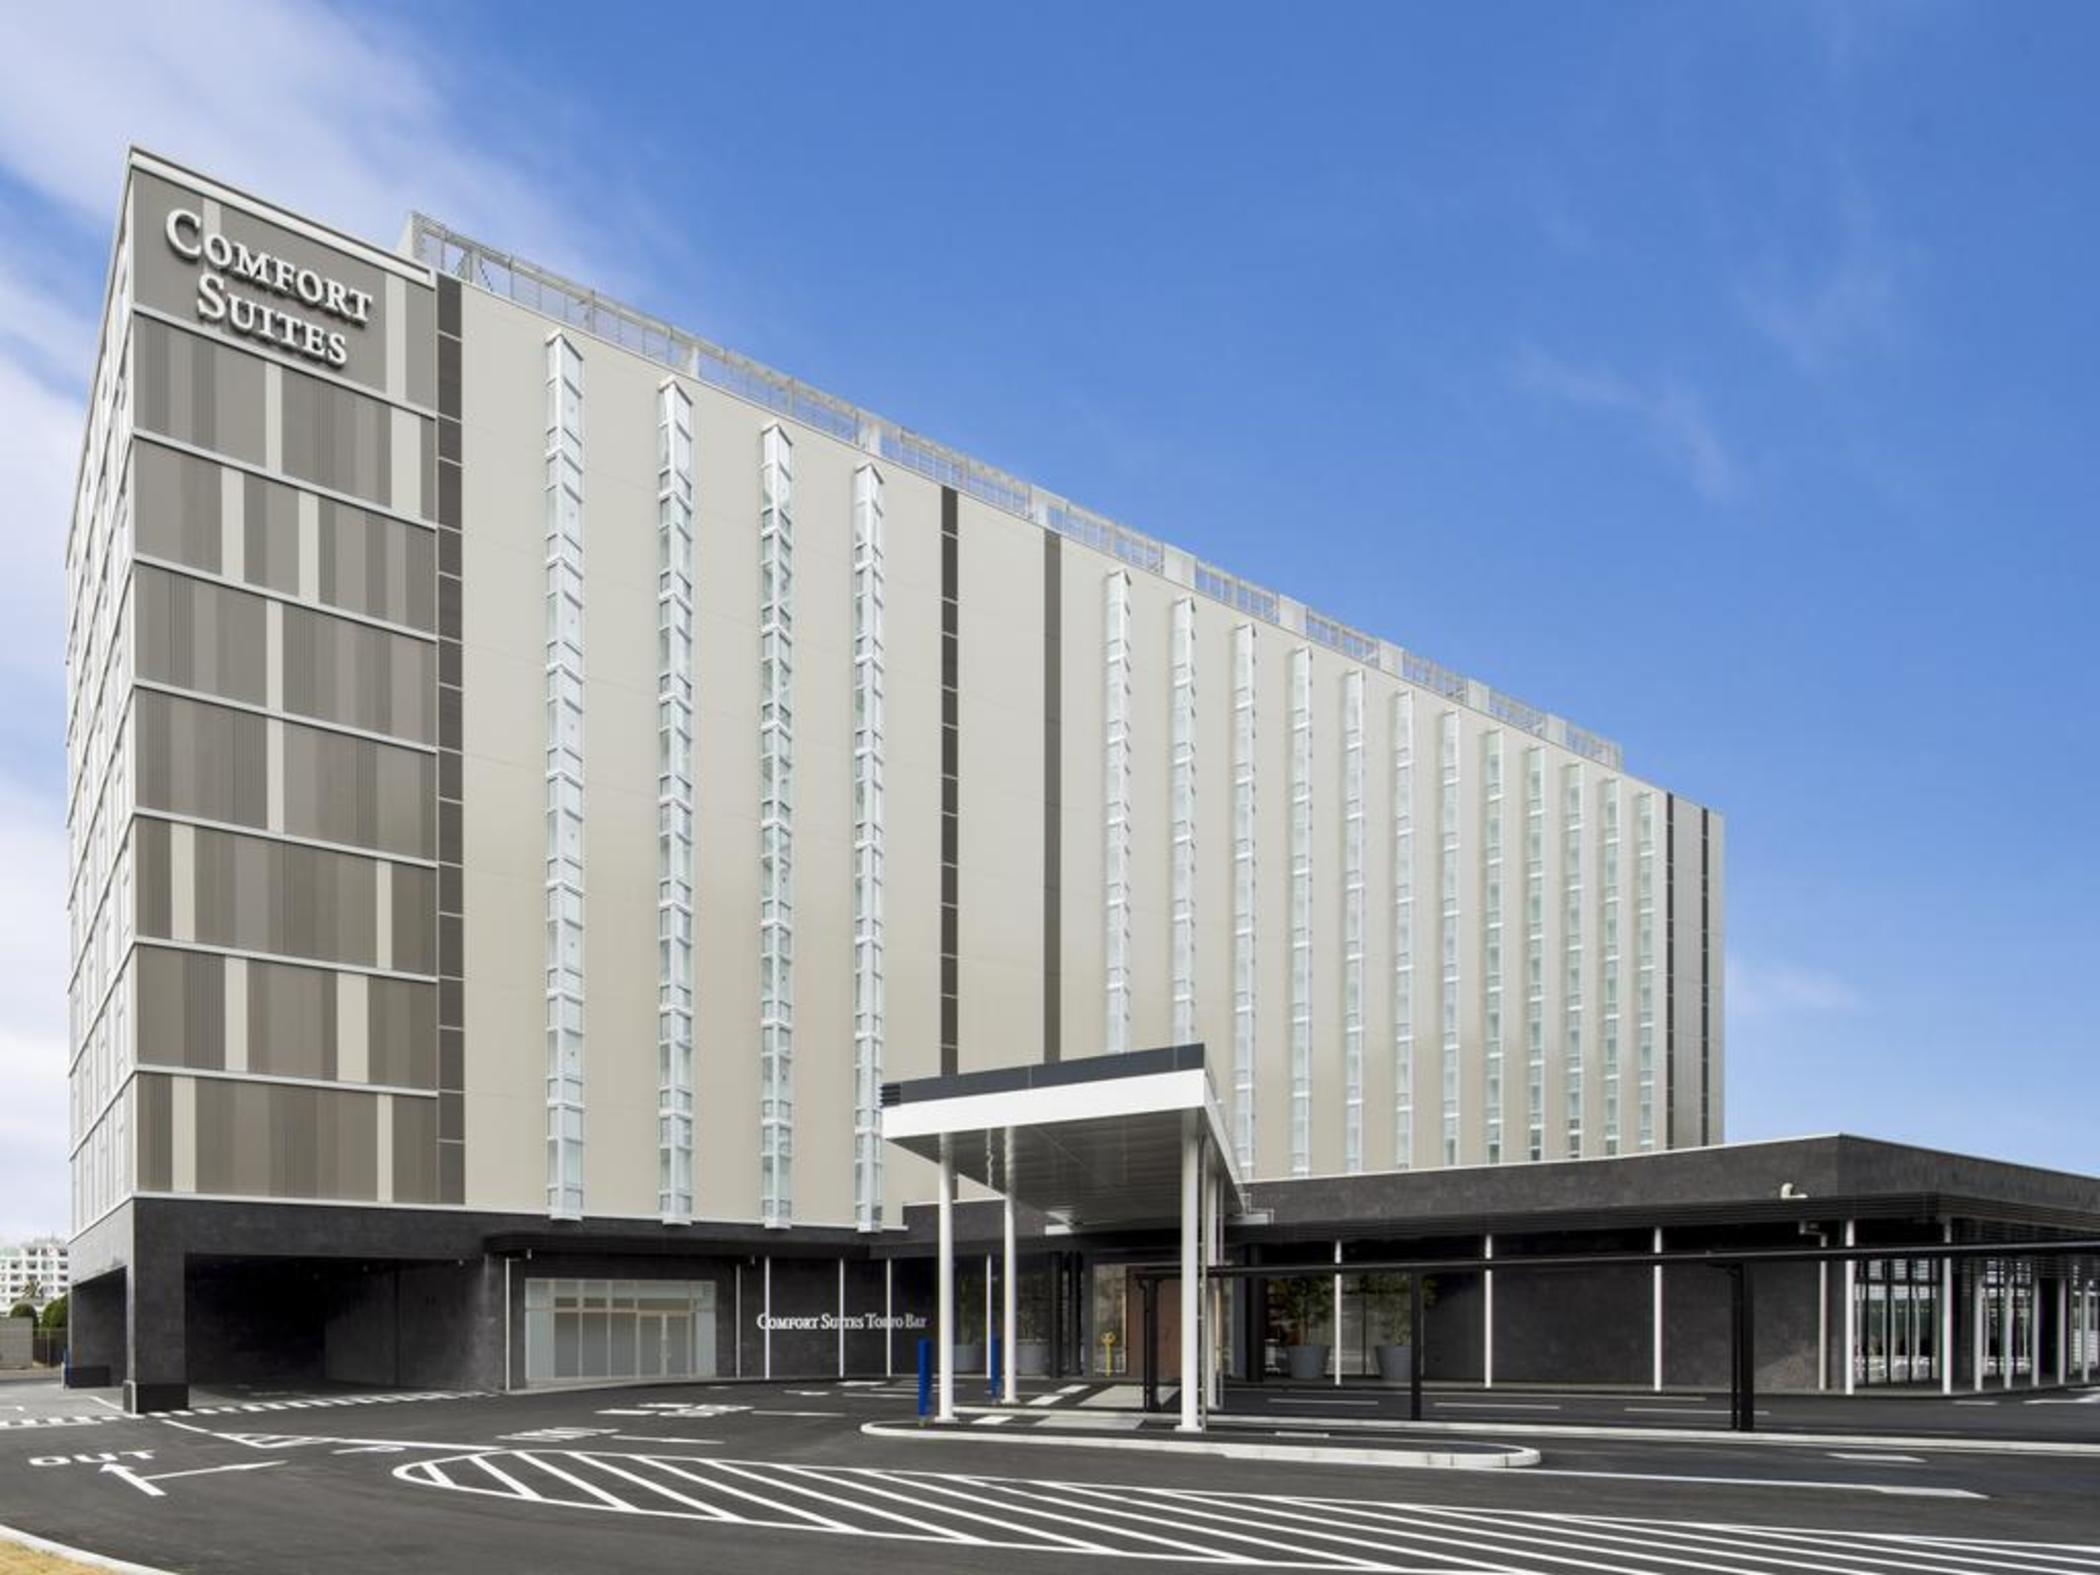 Comfort Suites Tokyo, Edogawa